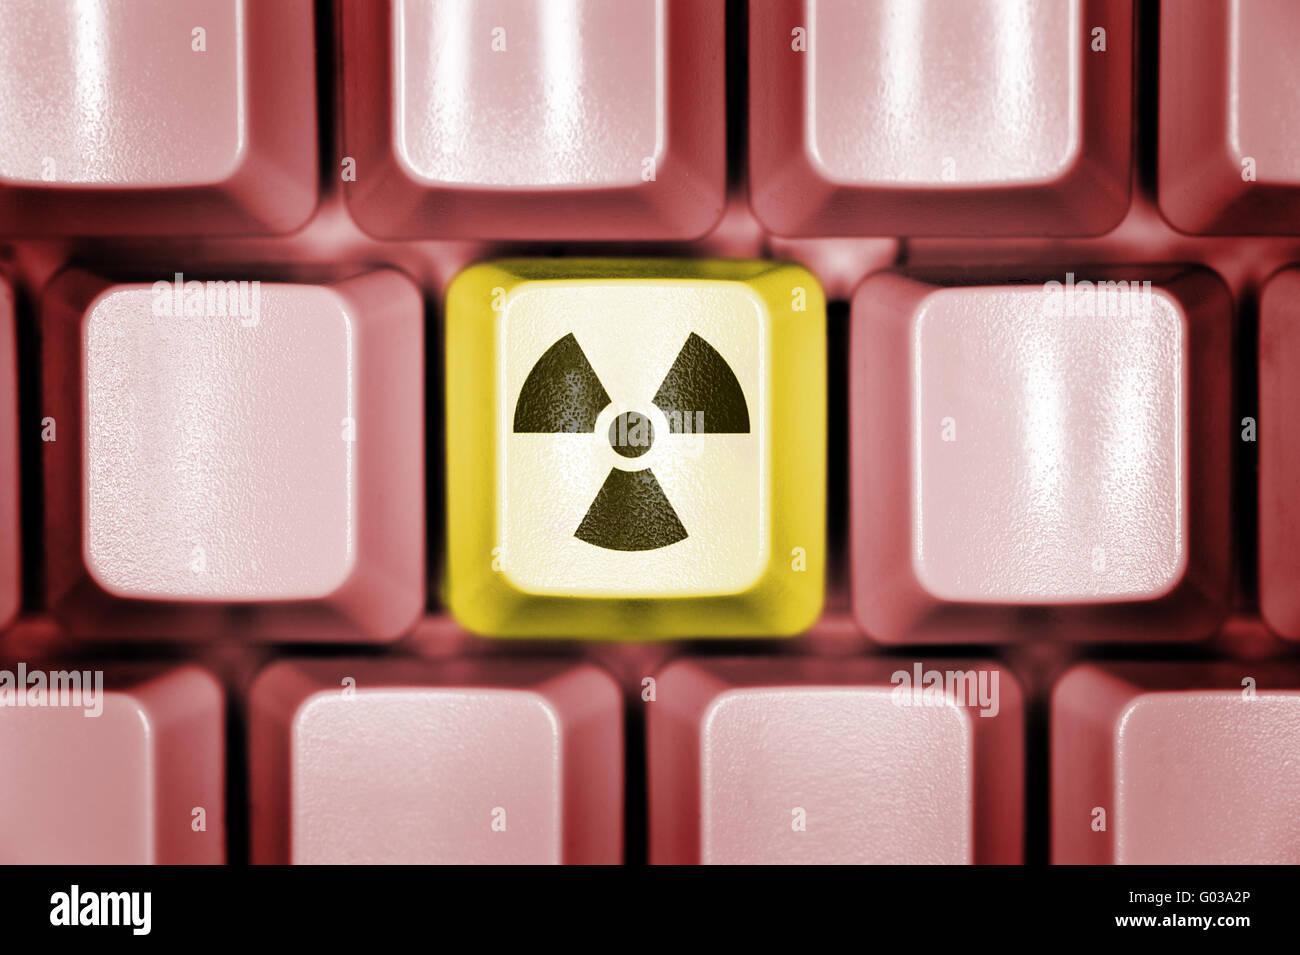 Computer keyboard with radioactivity sign - Stock Image